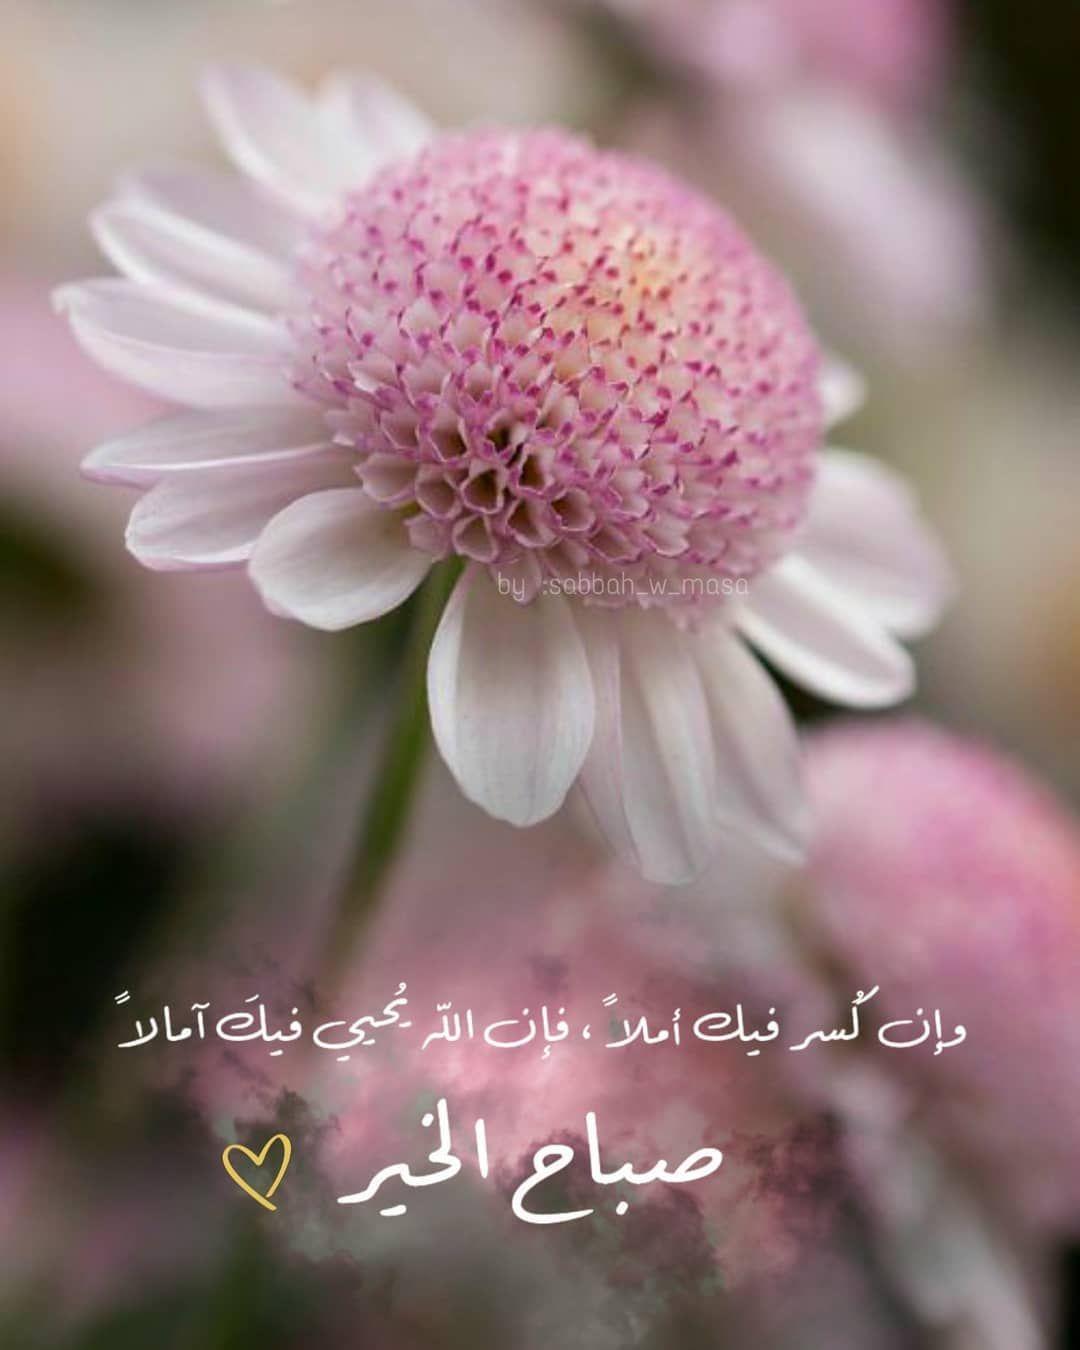 صبح و مساء On Instagram ص باح الخي ر ص Good Evening Greetings Good Morning Flowers Good Morning Beautiful Quotes